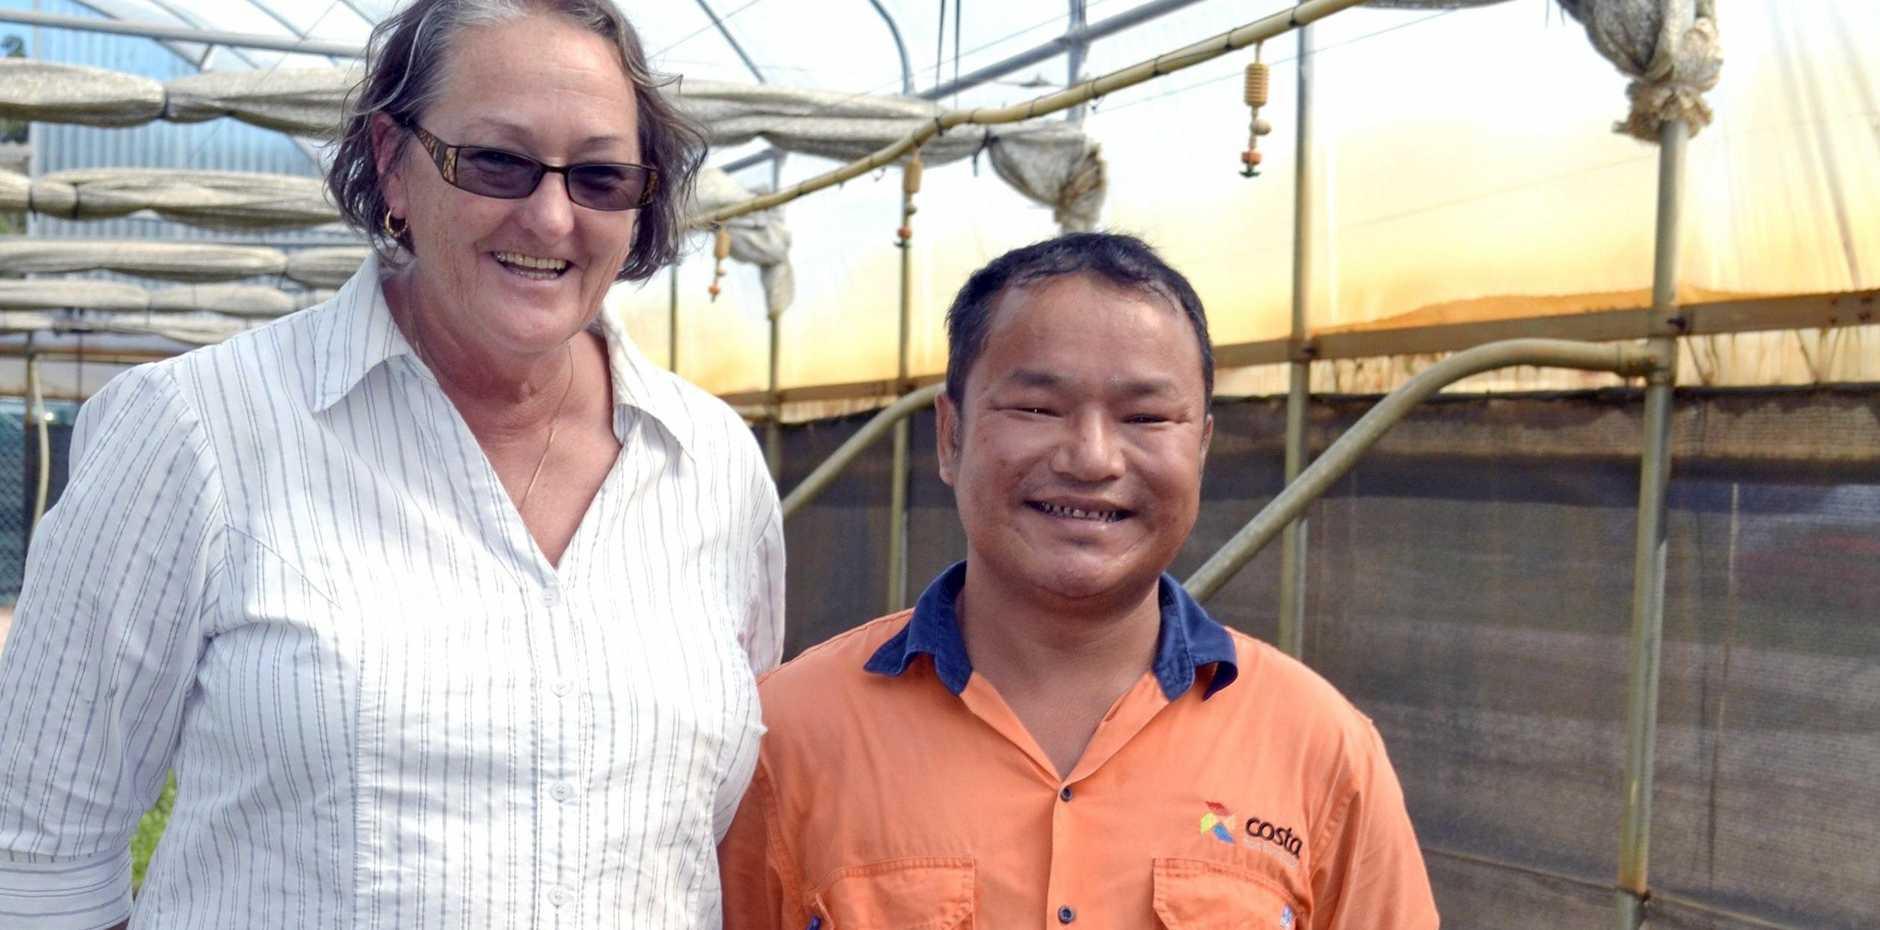 VALUED EMPLOYEE: Maria Skinner and Peng Uk Lian Chin.